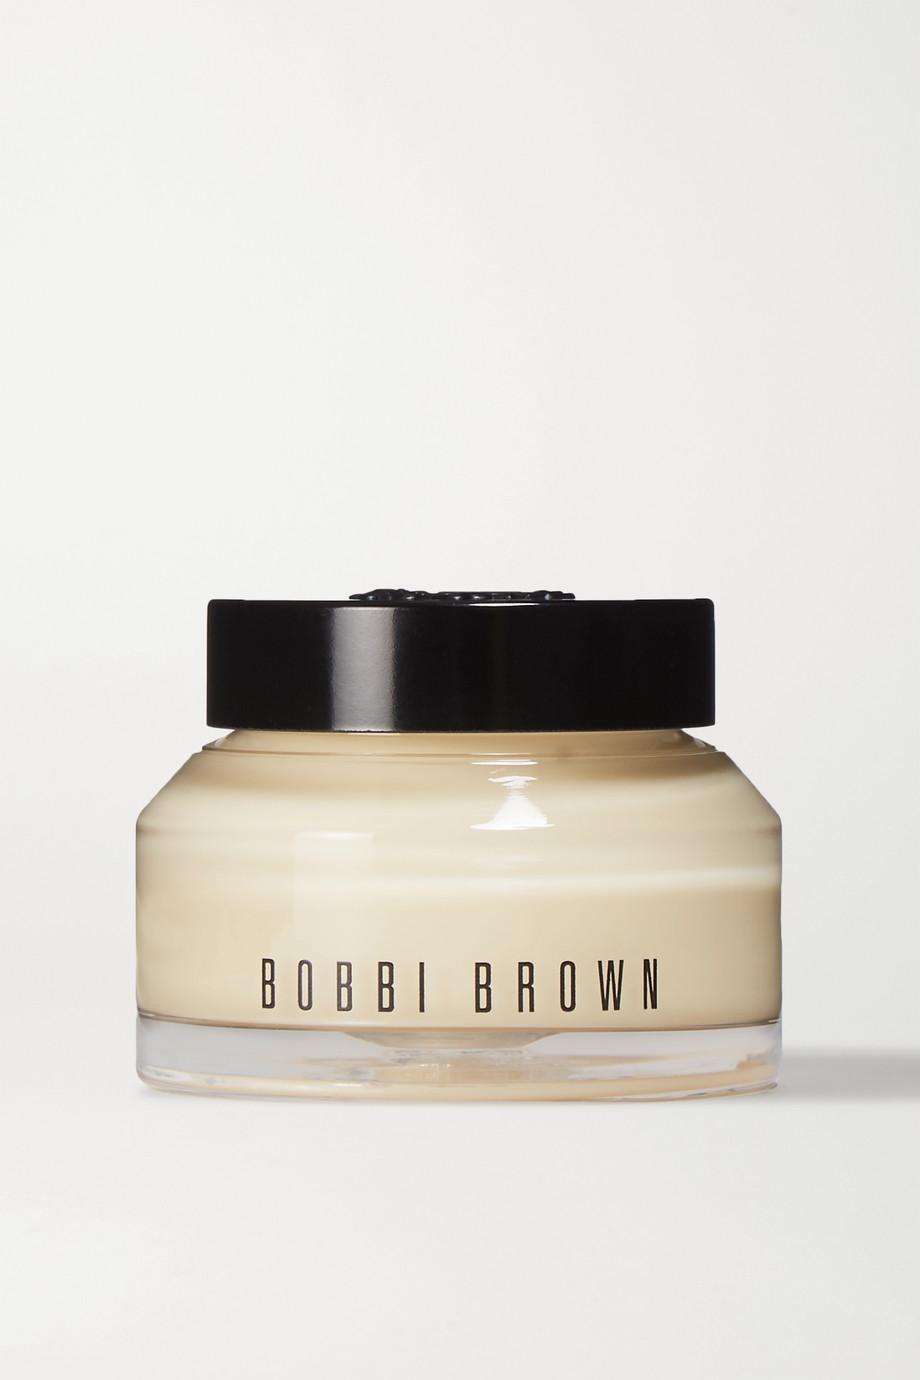 Bobbi Brown Vitamin Enriched Face Base, 50ml